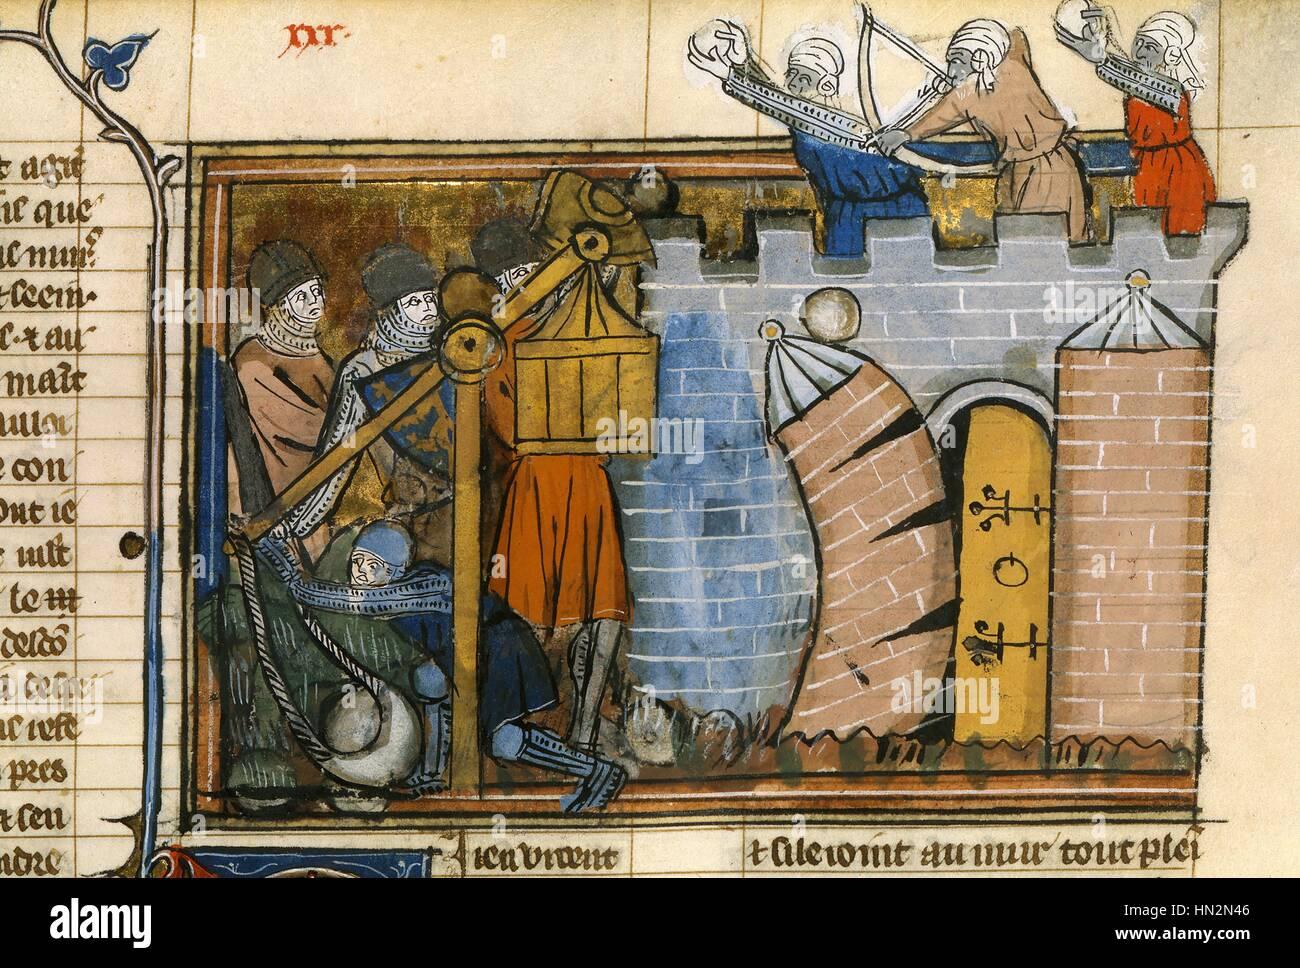 1st Crusade (1096-1099). The Romance of Godfrey of Bouillon (Le Roman de Godefroy de Bouillon). The capture of Jerusalem. - Stock Image